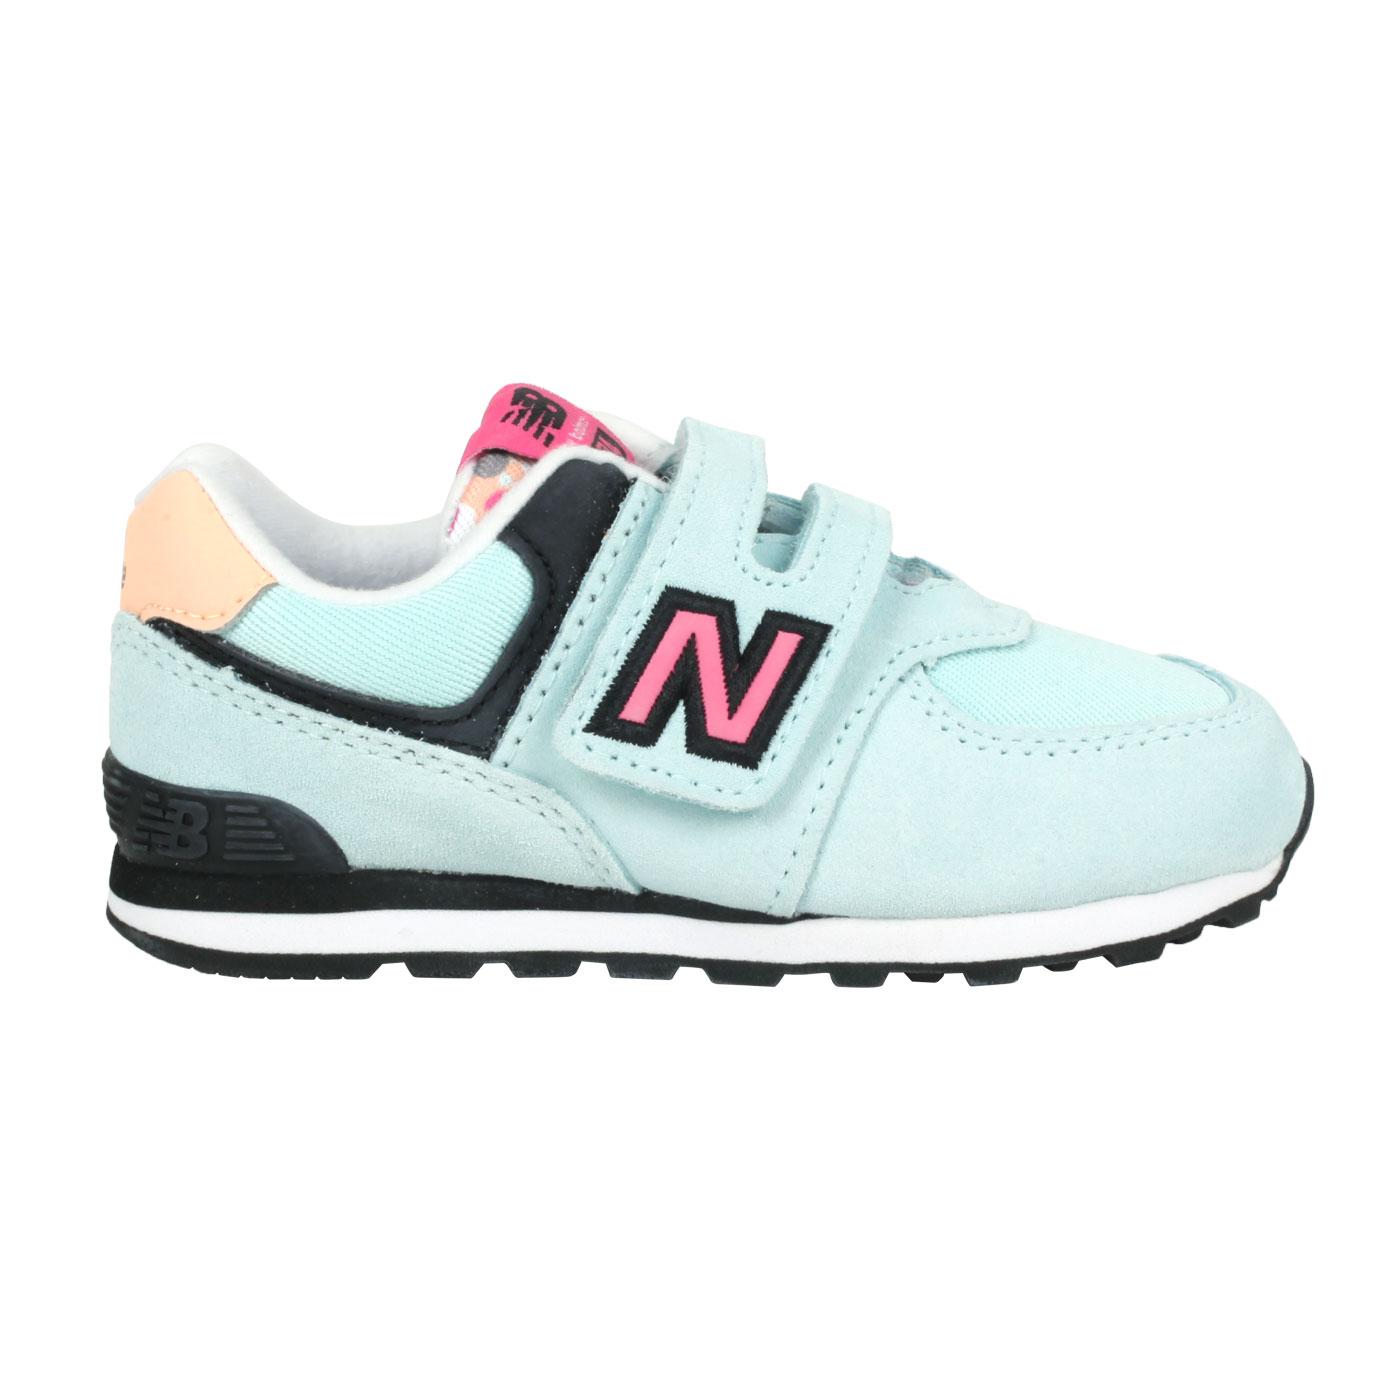 NEW BALANCE 小童運動鞋-WIDE IV574WP1